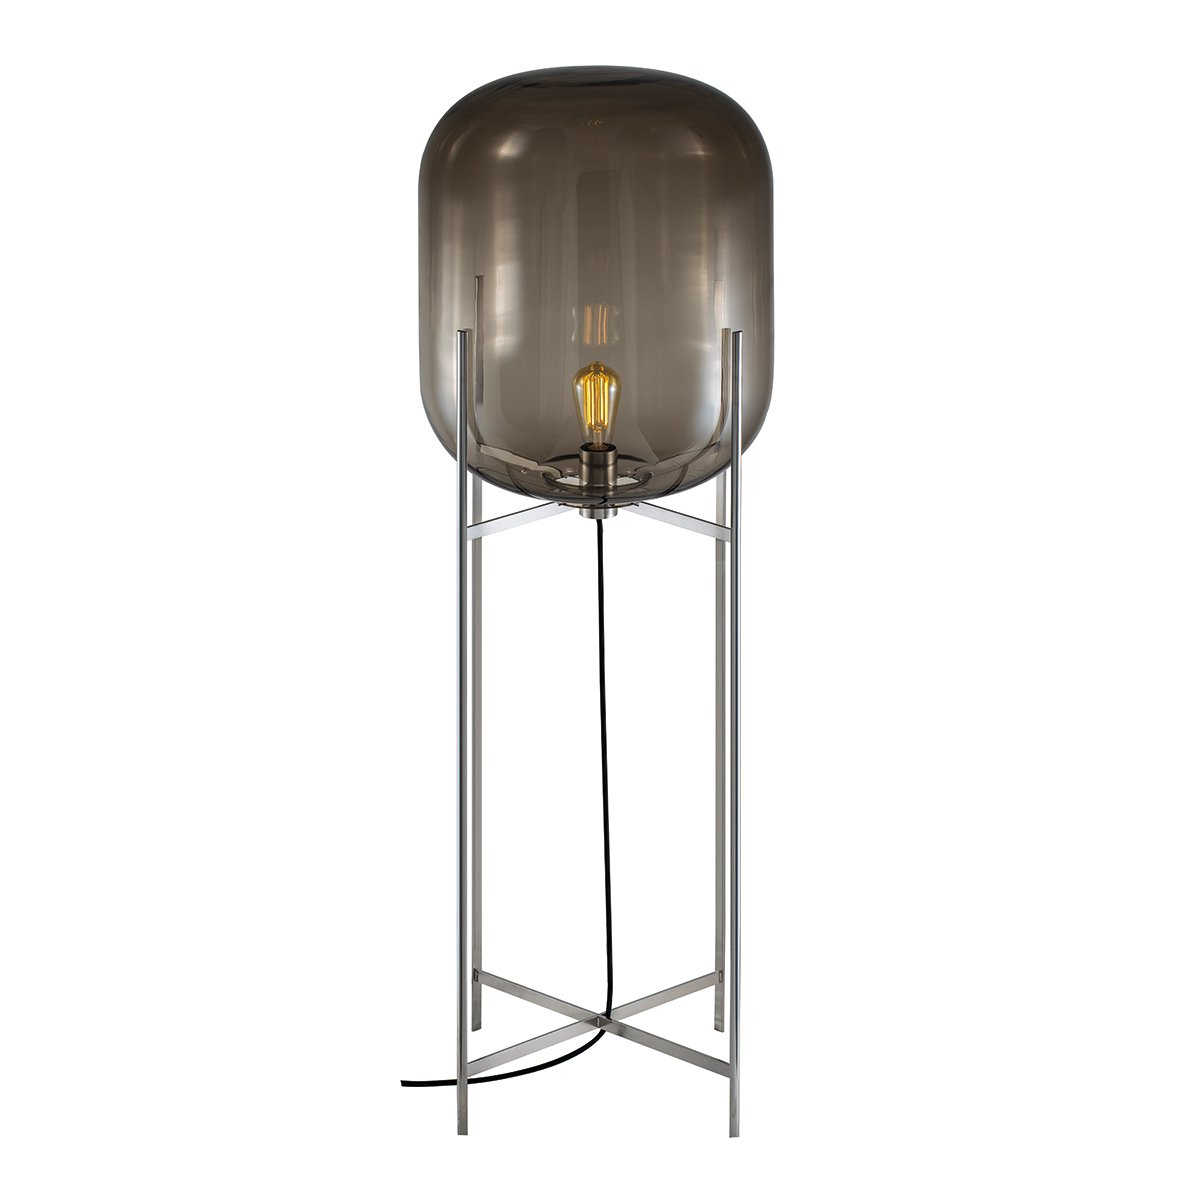 Pulpo Oda Vloerlamp Large (2014) - Smoke Grey / Chroom